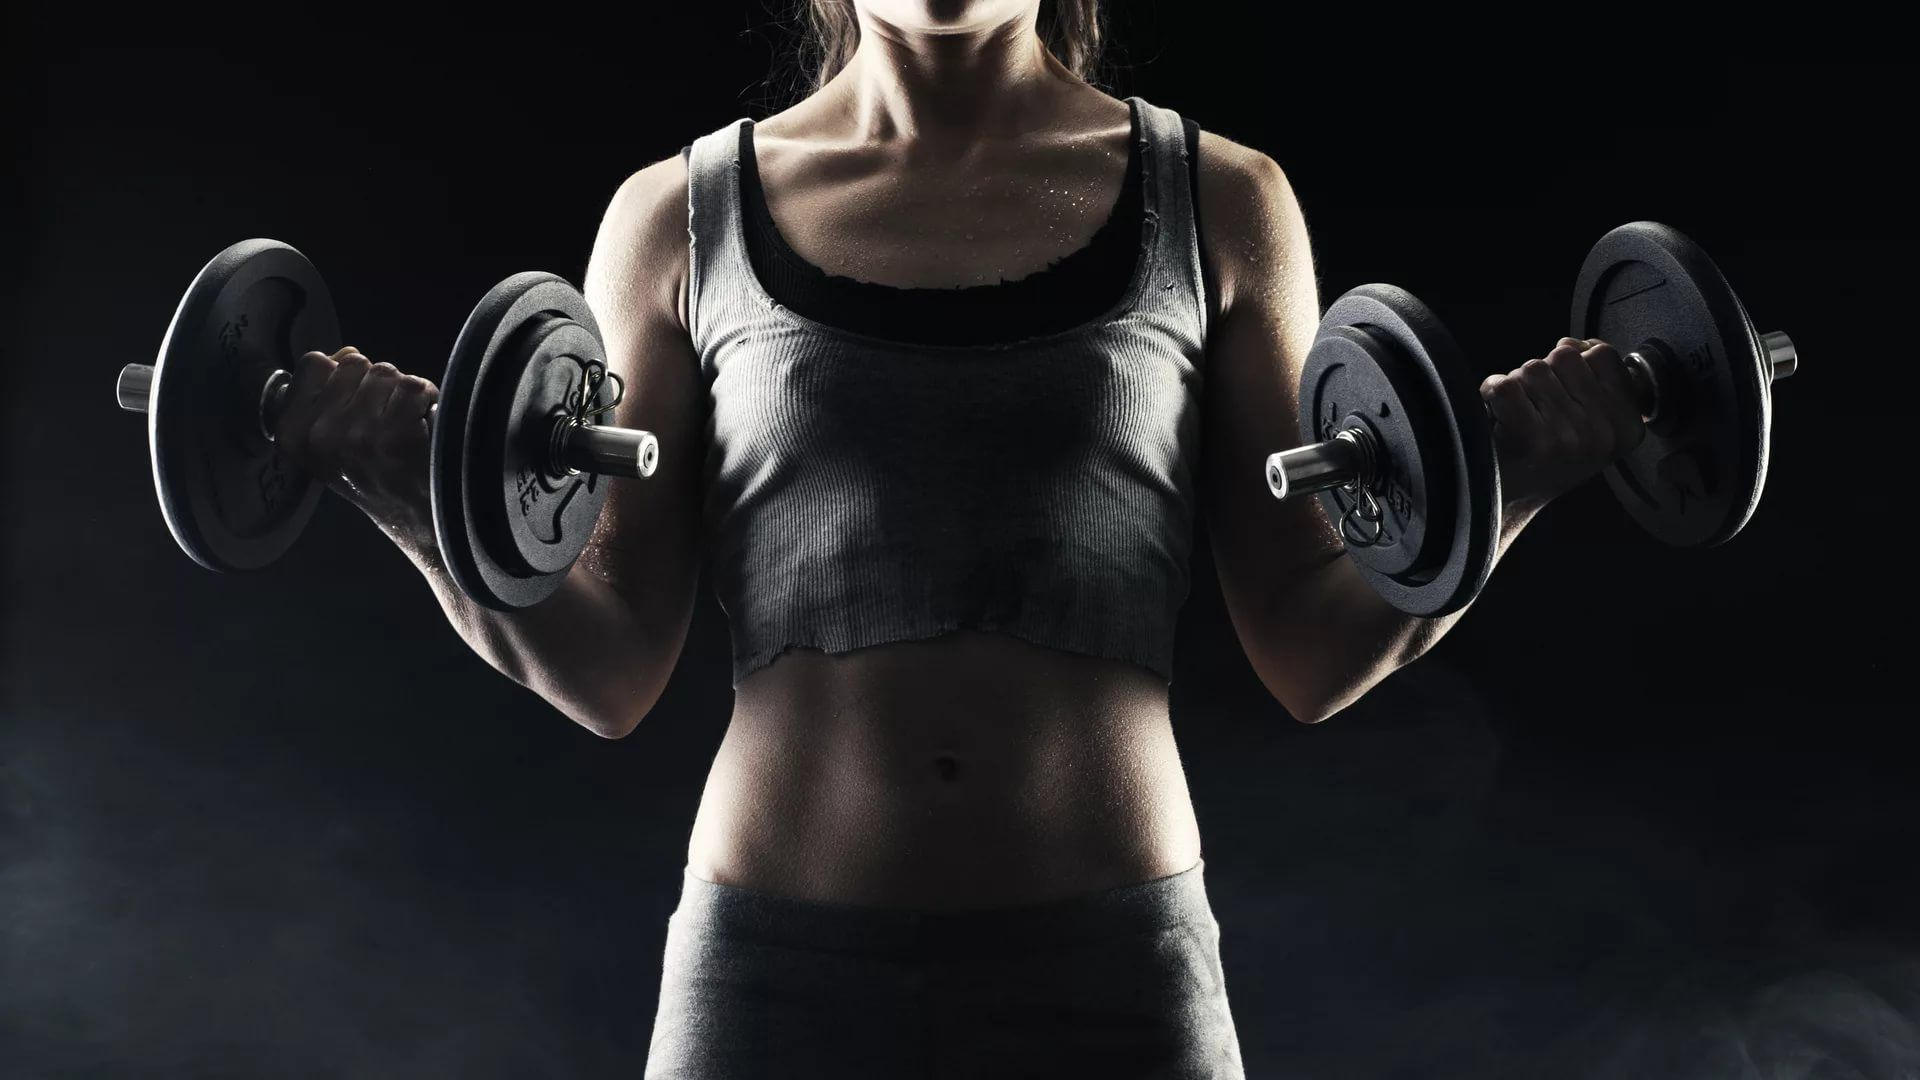 Workout High Definition